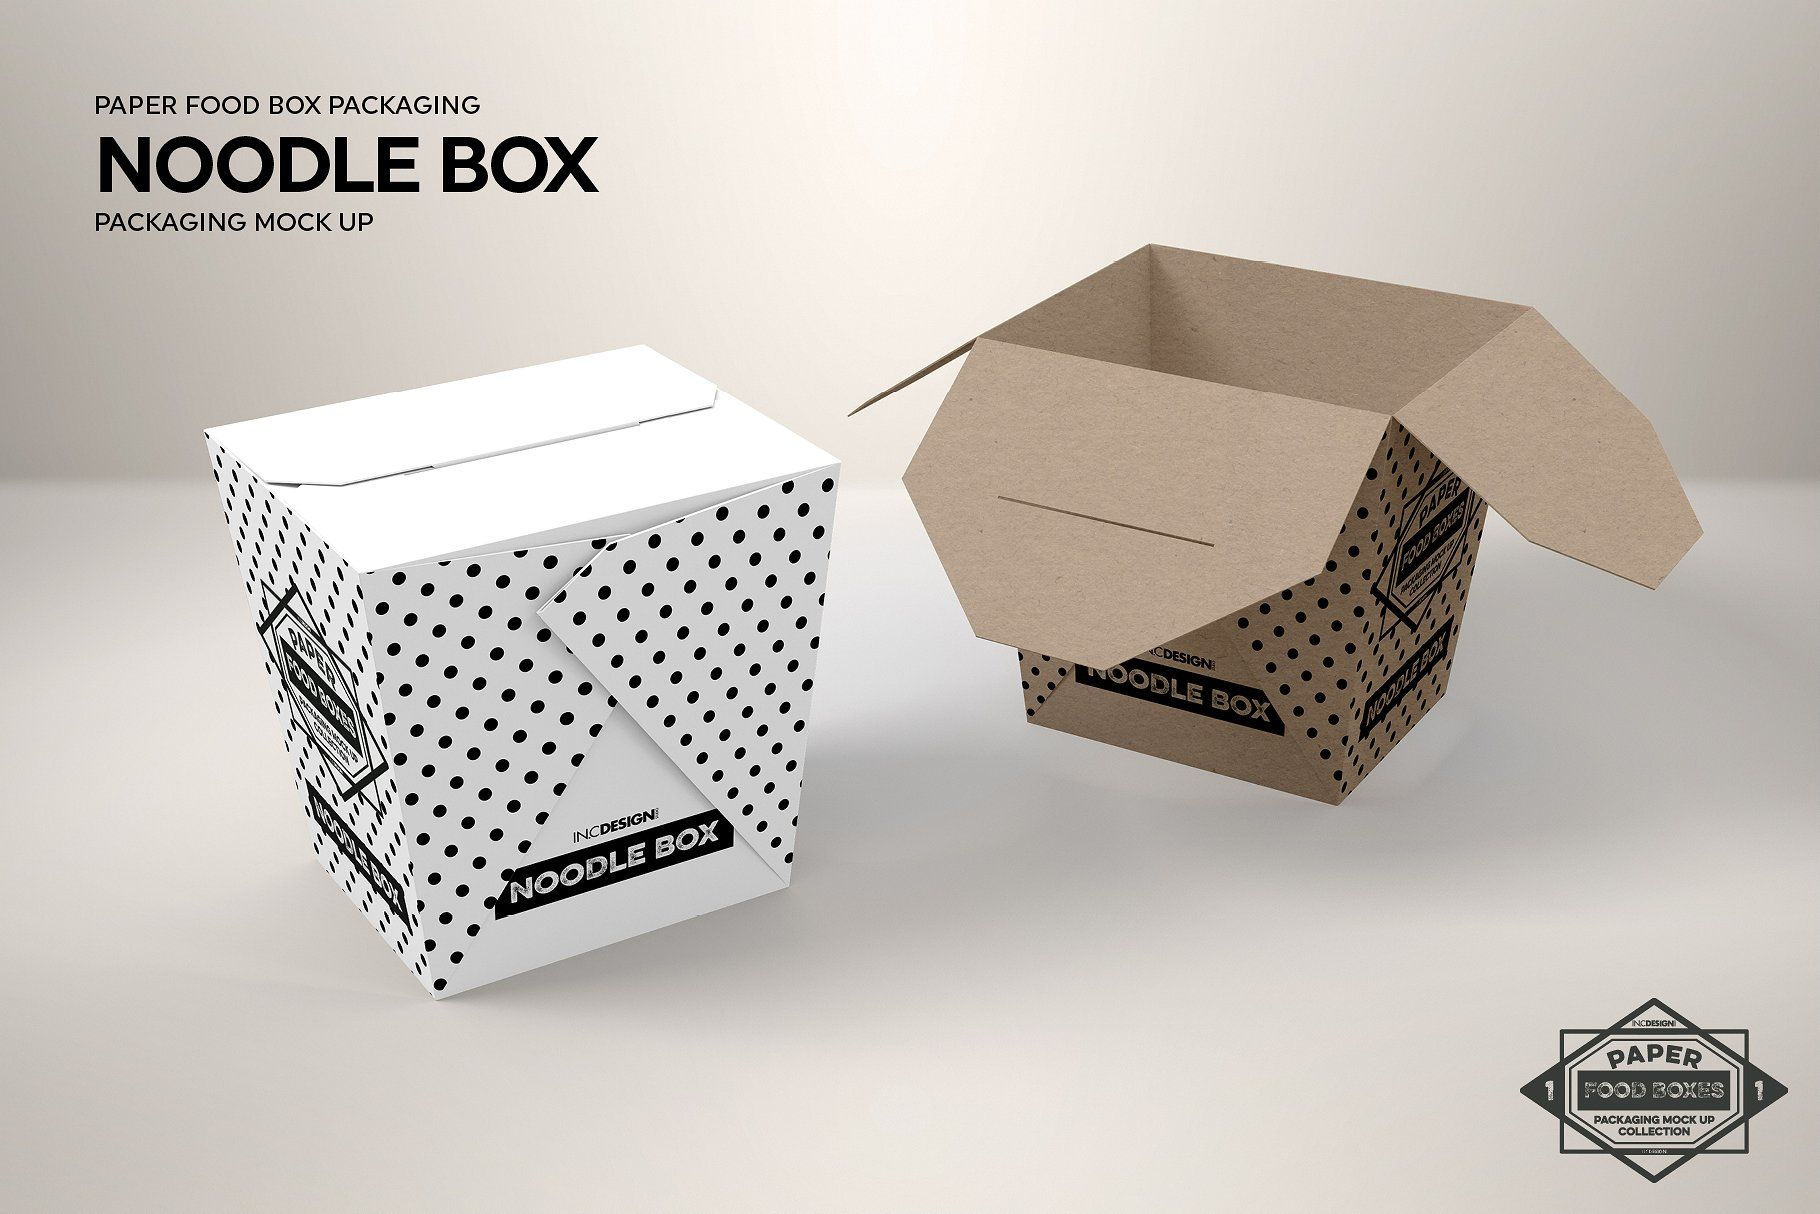 Download Noodle Box Packaging Mockup Packaging Mockup Food Box Packaging Box Packaging